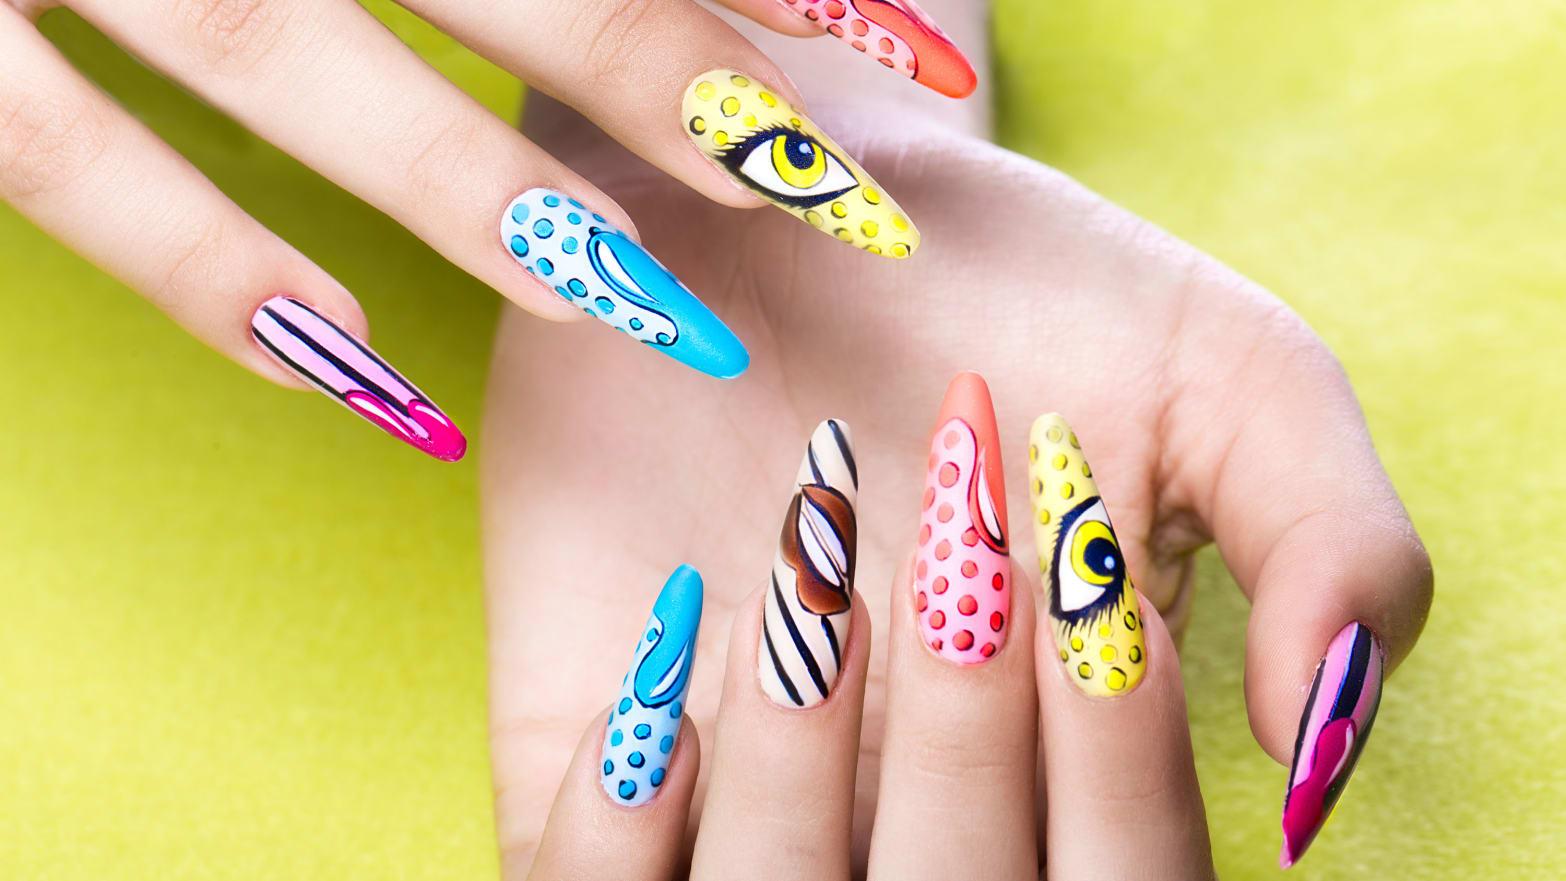 long Nails Home Remedies